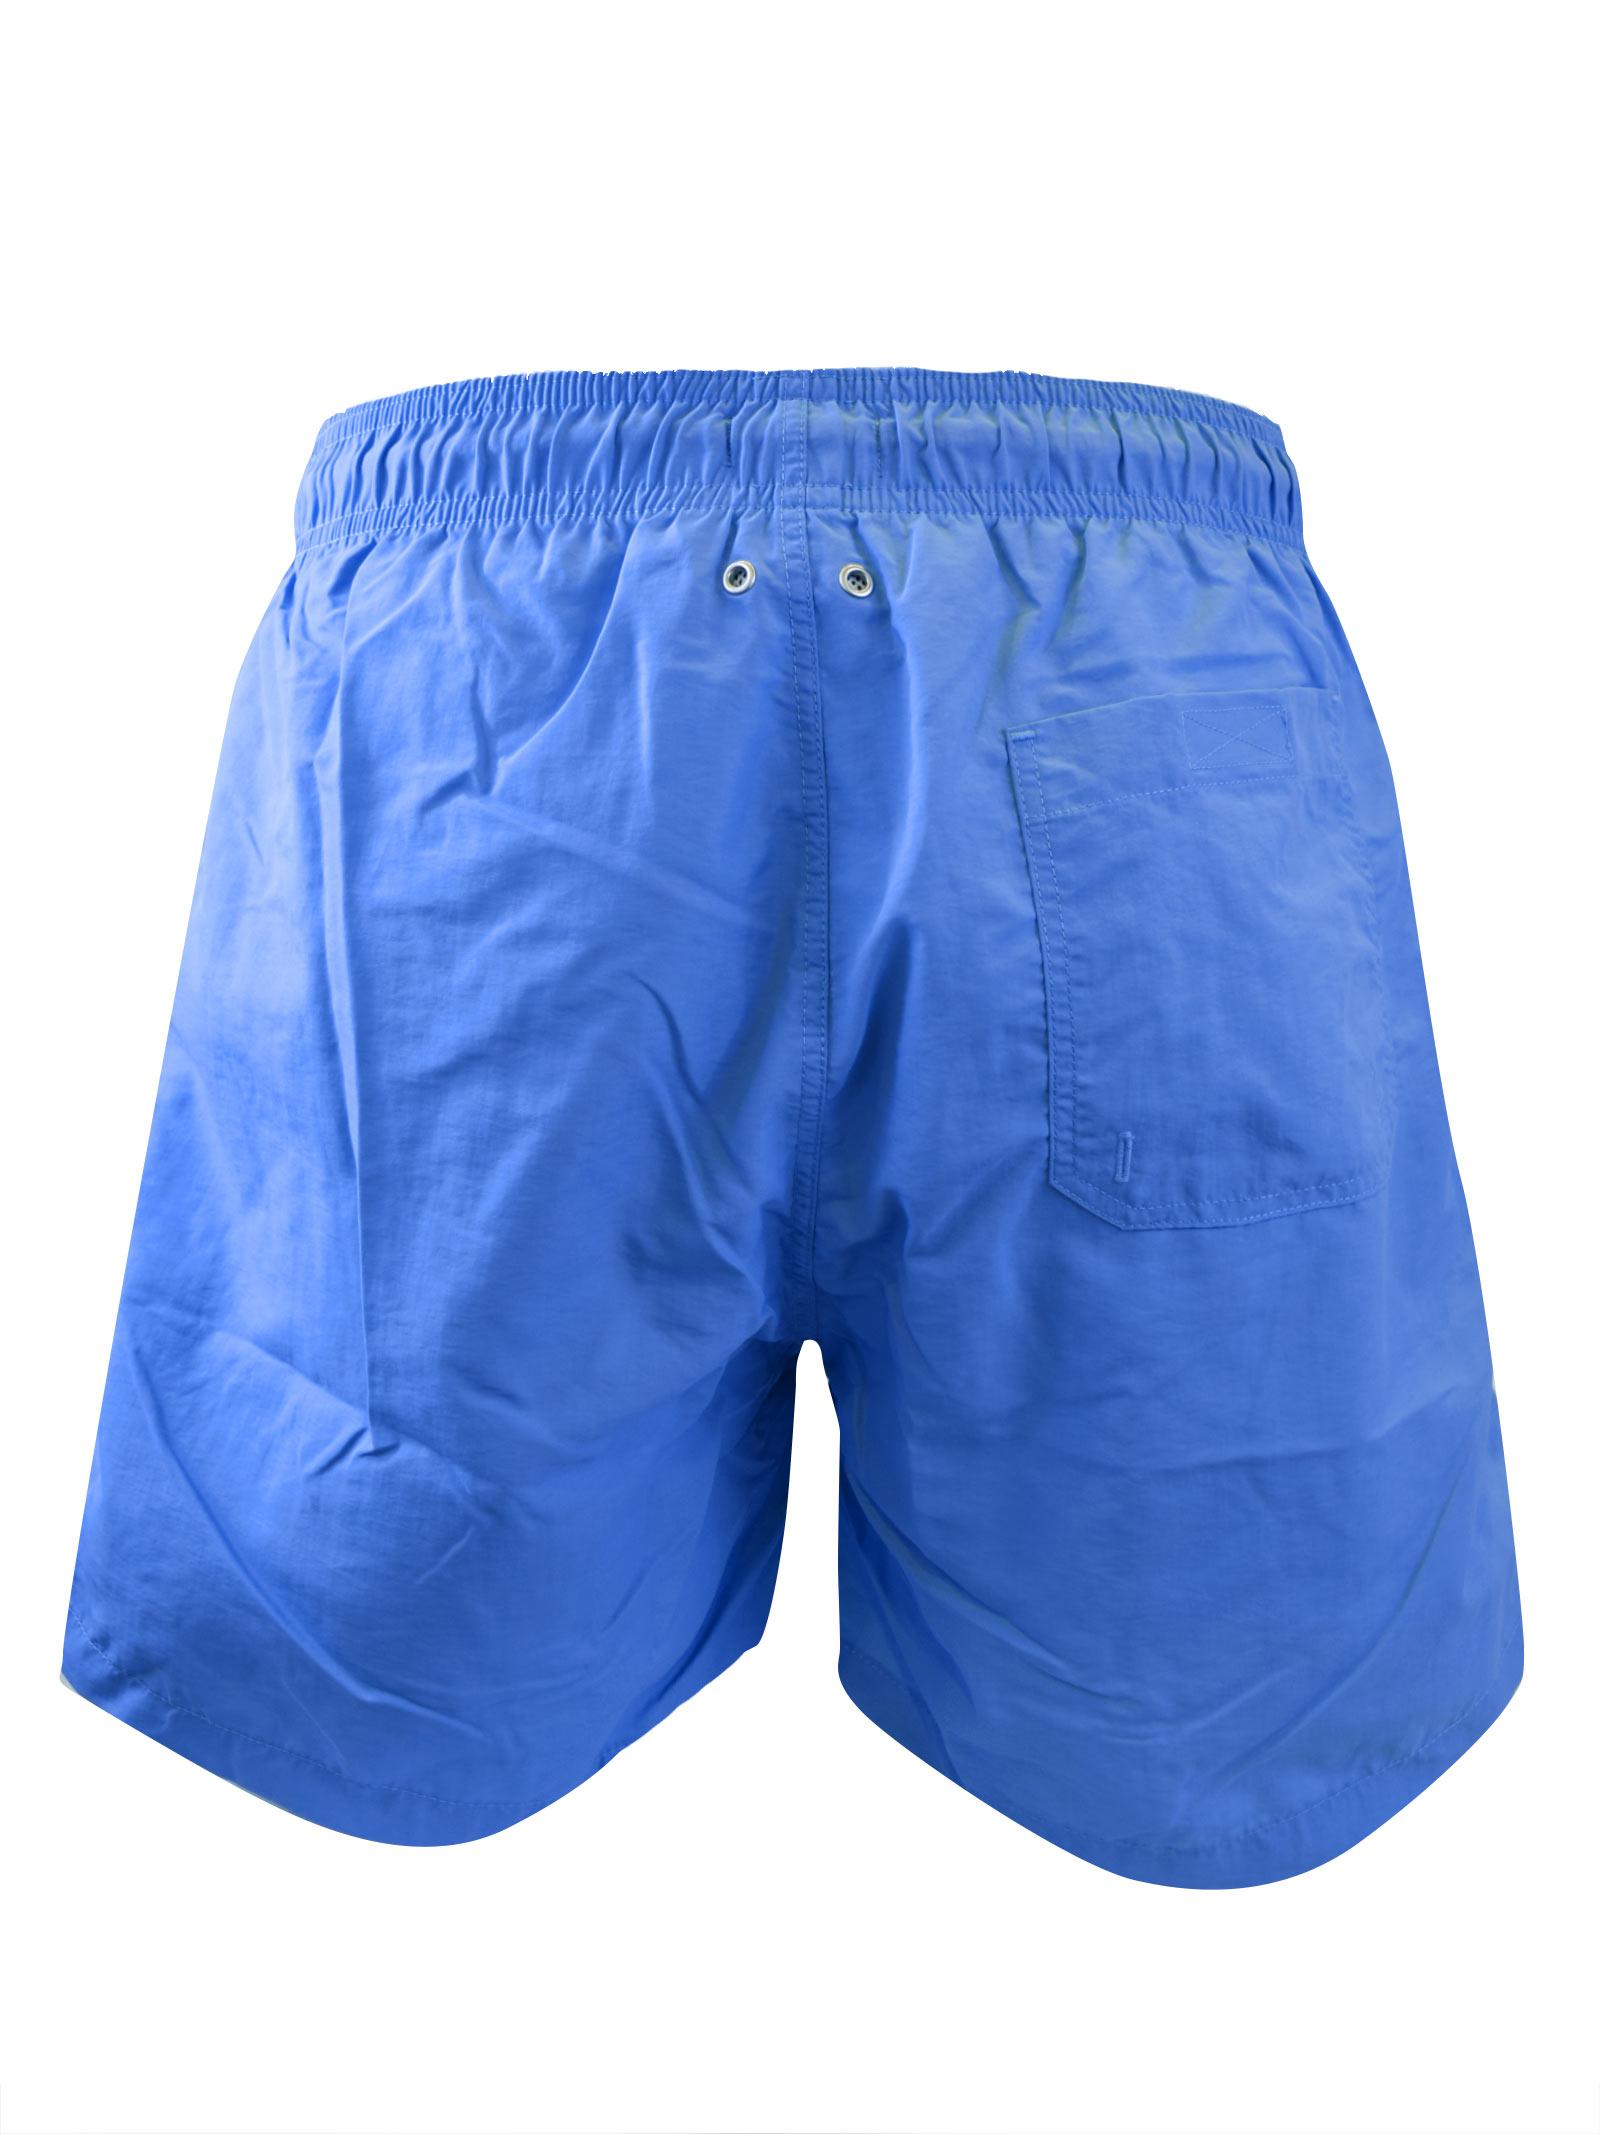 solid color swim trunk  GANT |  | 922016001444